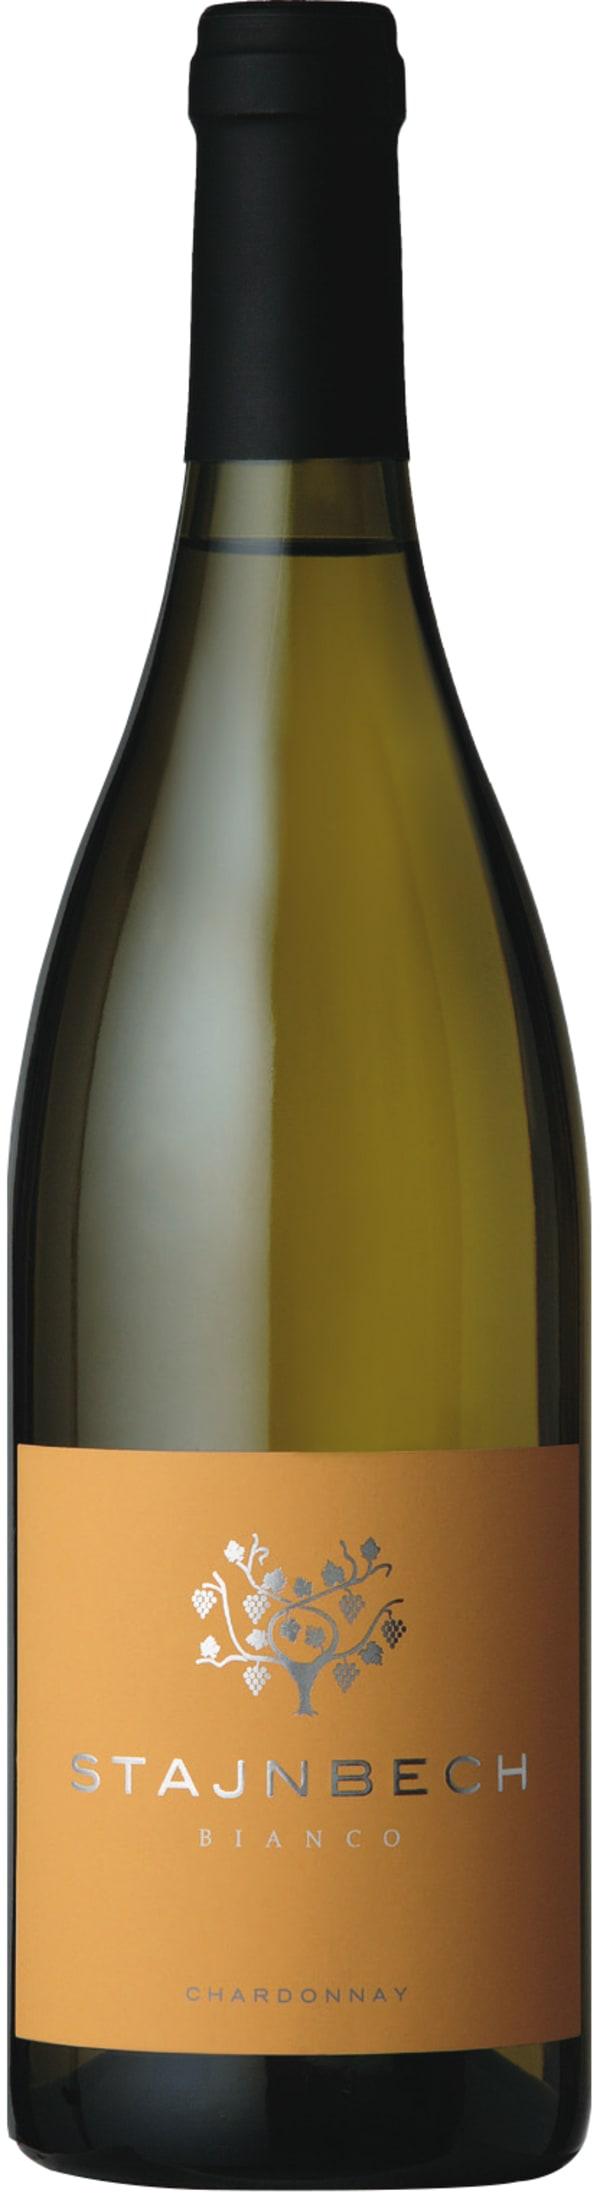 Borgo Stajnbech Bianco Chardonnay 2015